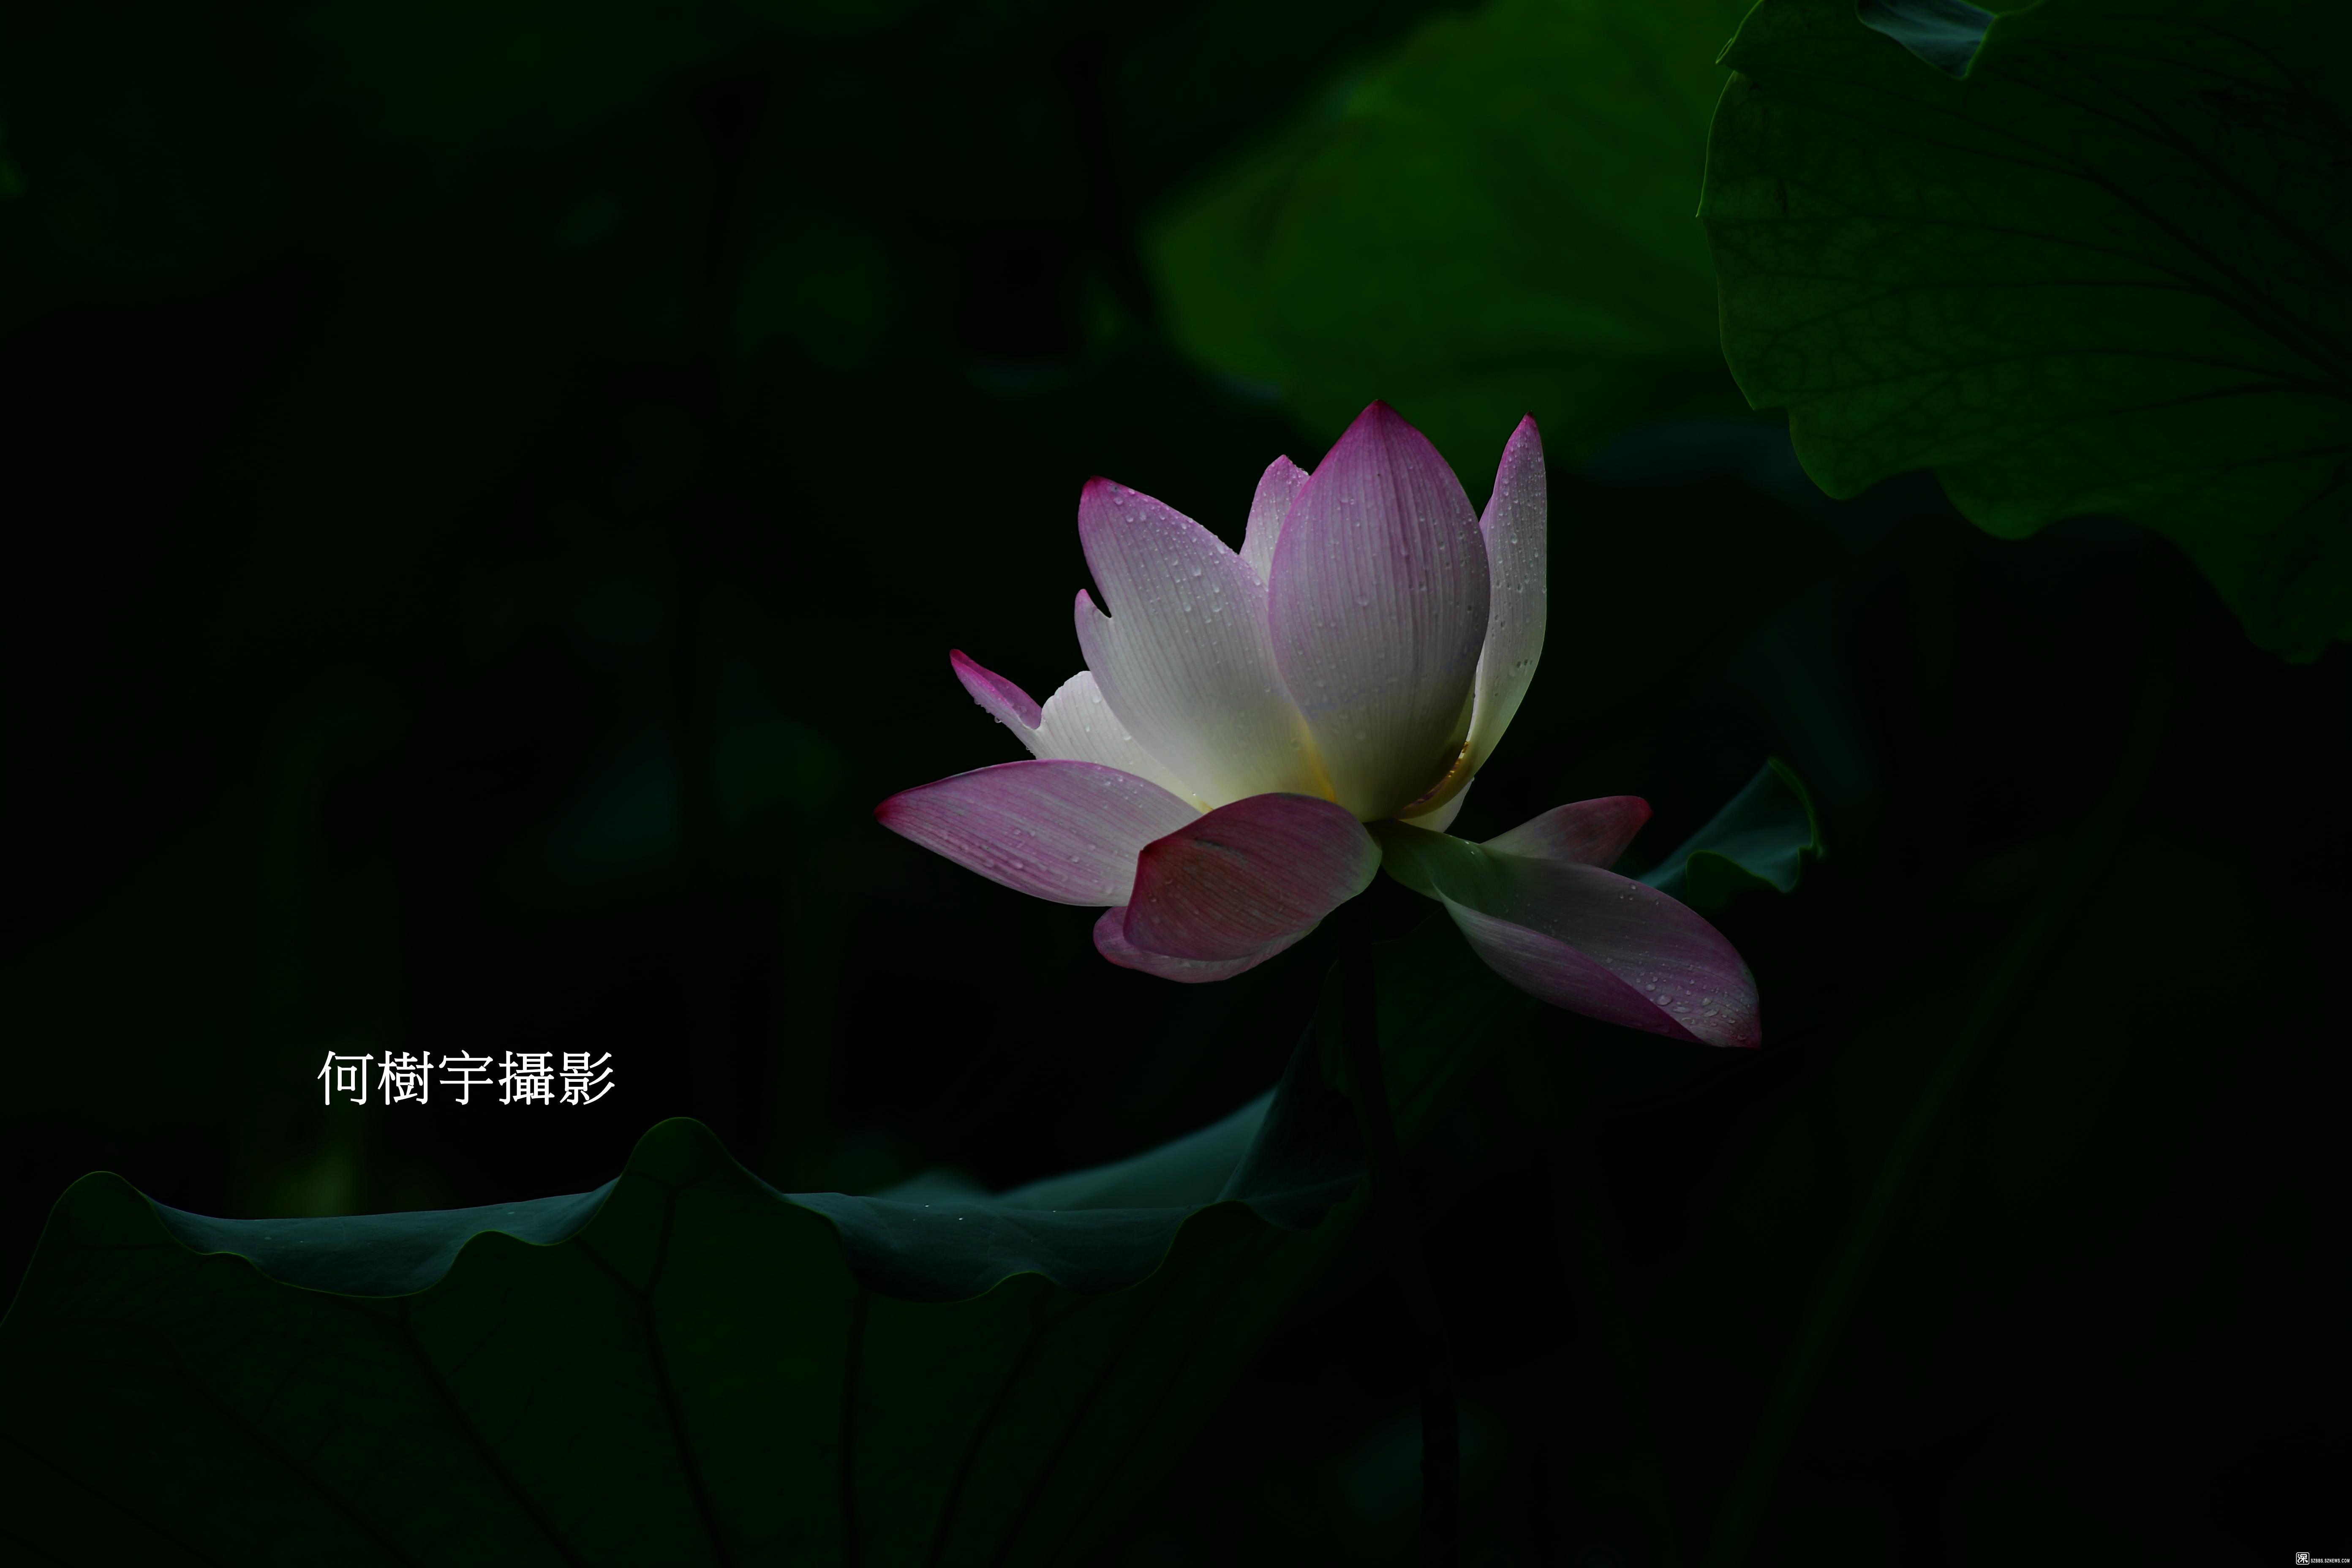 DSC_6850.JPG